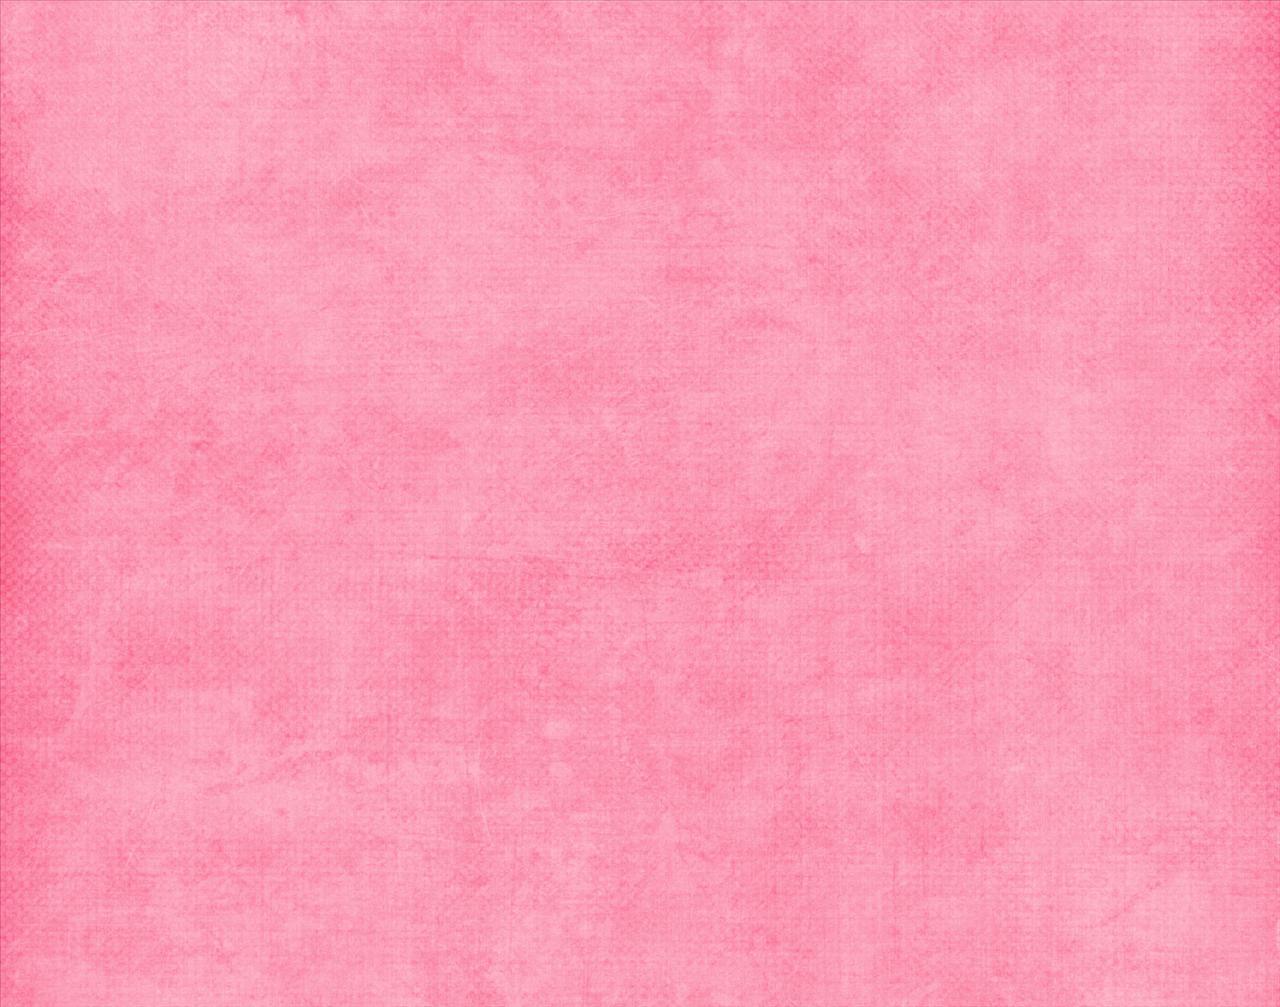 Unduh 85 Background Pink Pinterest Paling Keren